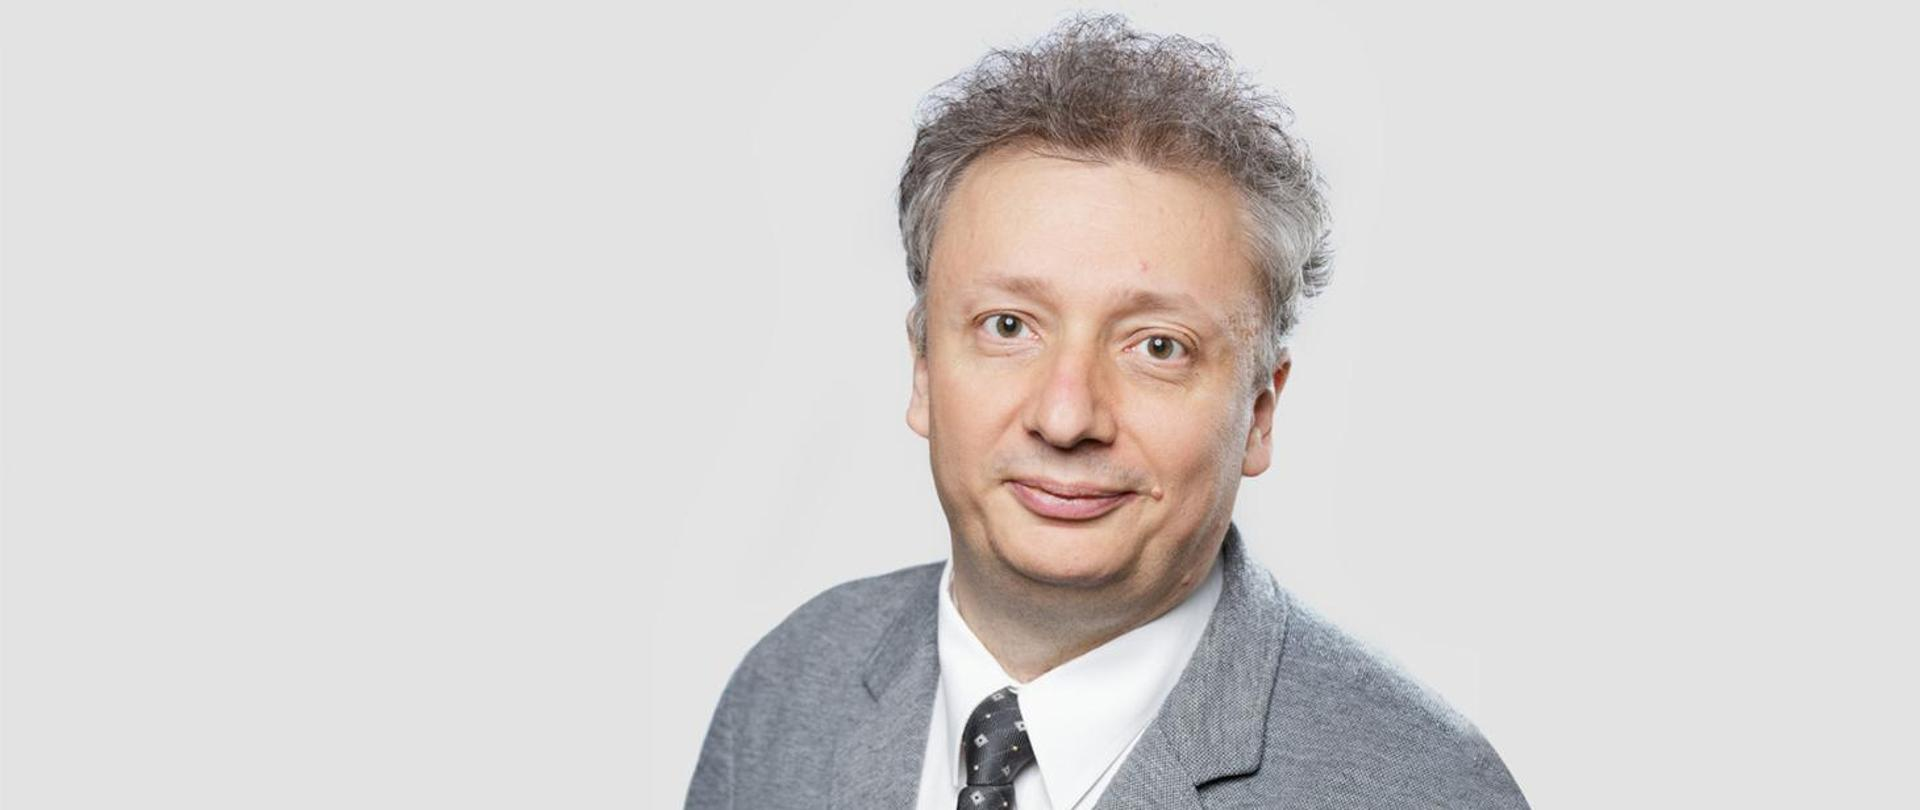 Podsekretarza stanu Sebastian Skuza - zdjęcie portretowe